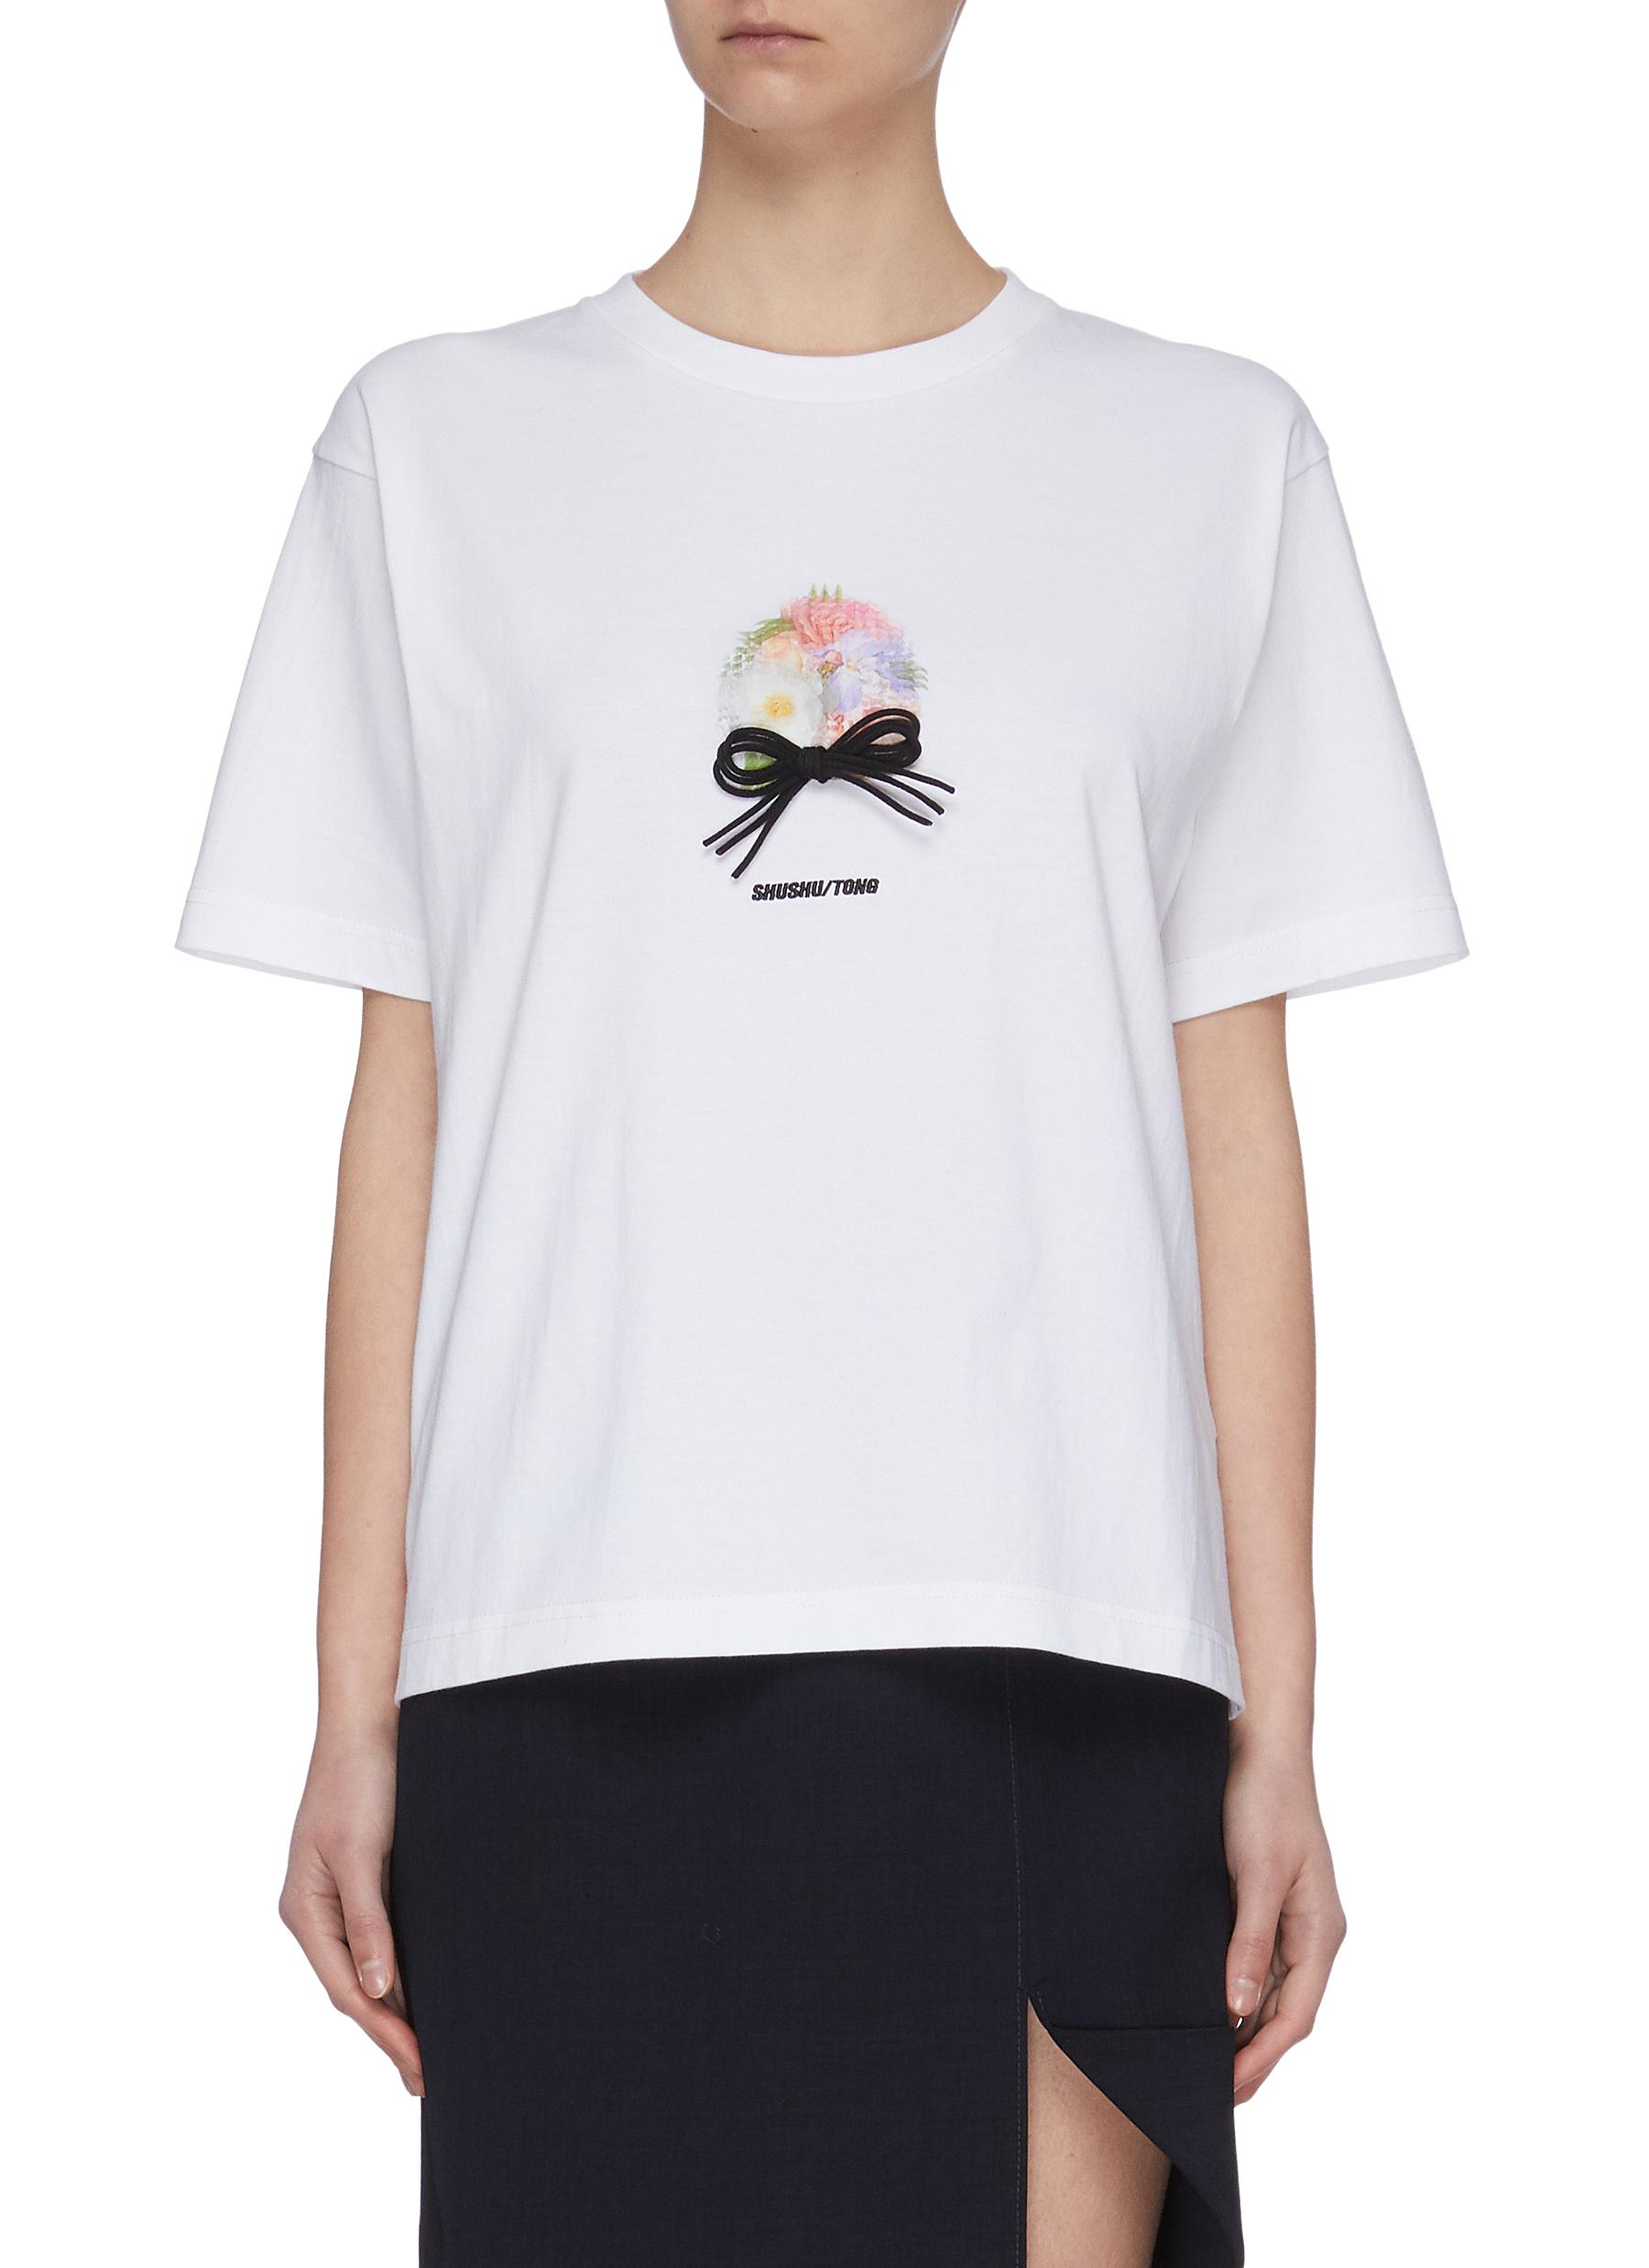 shop Shushu/Tong Floral Print Bow Detail T-shirt online